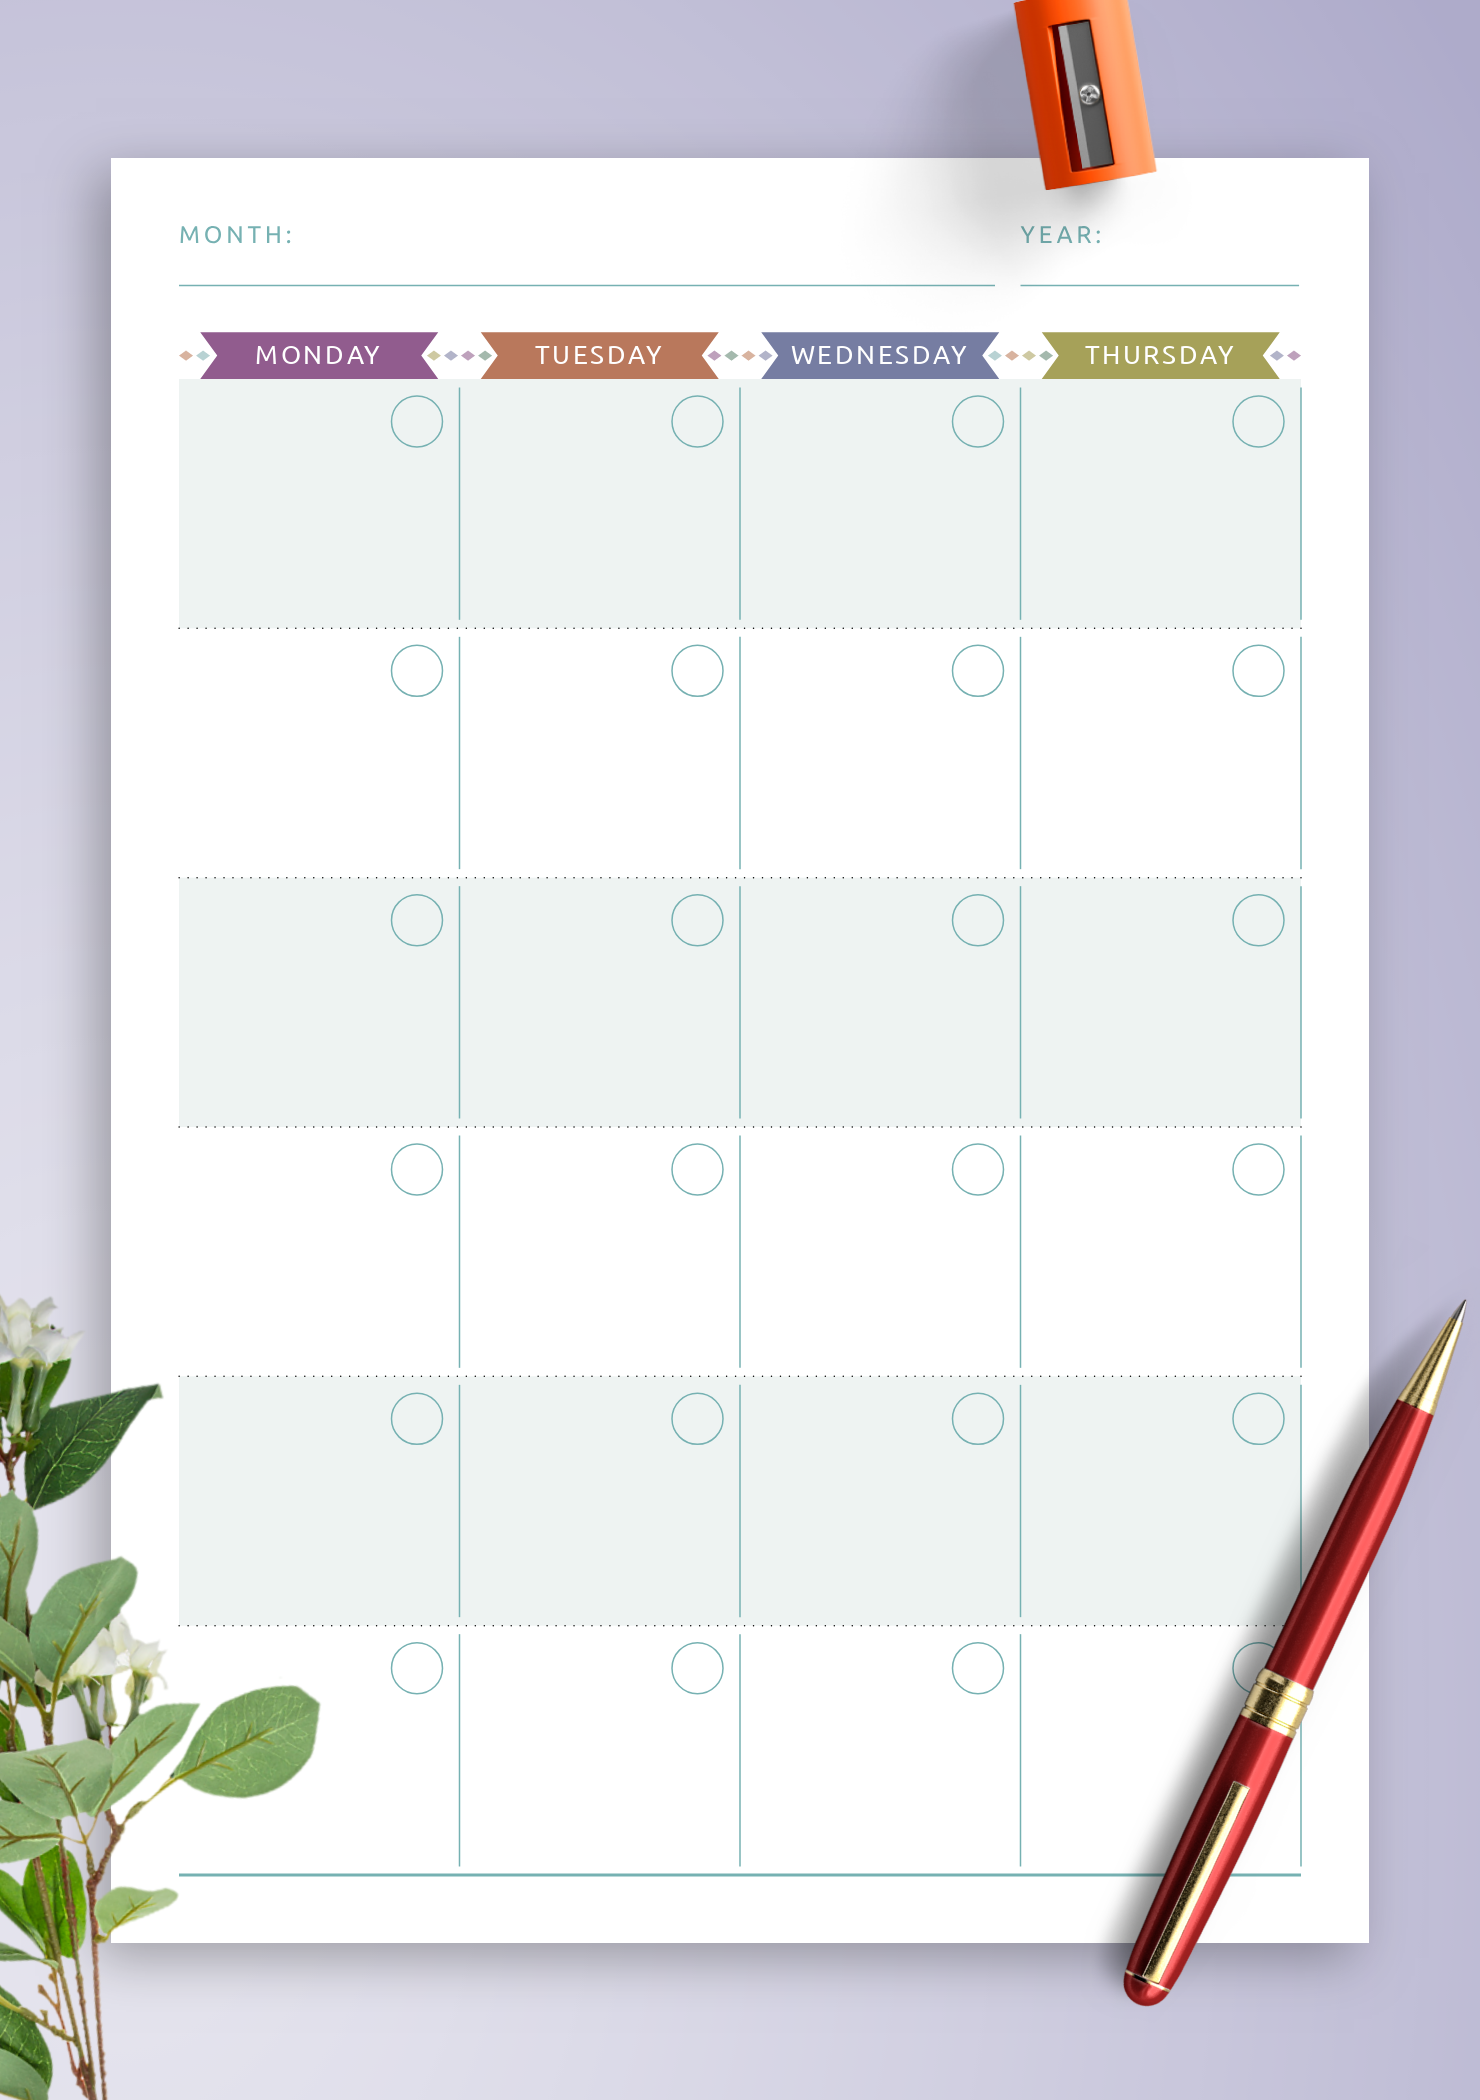 Download Printable Monthly Calendar Planner Undated ...